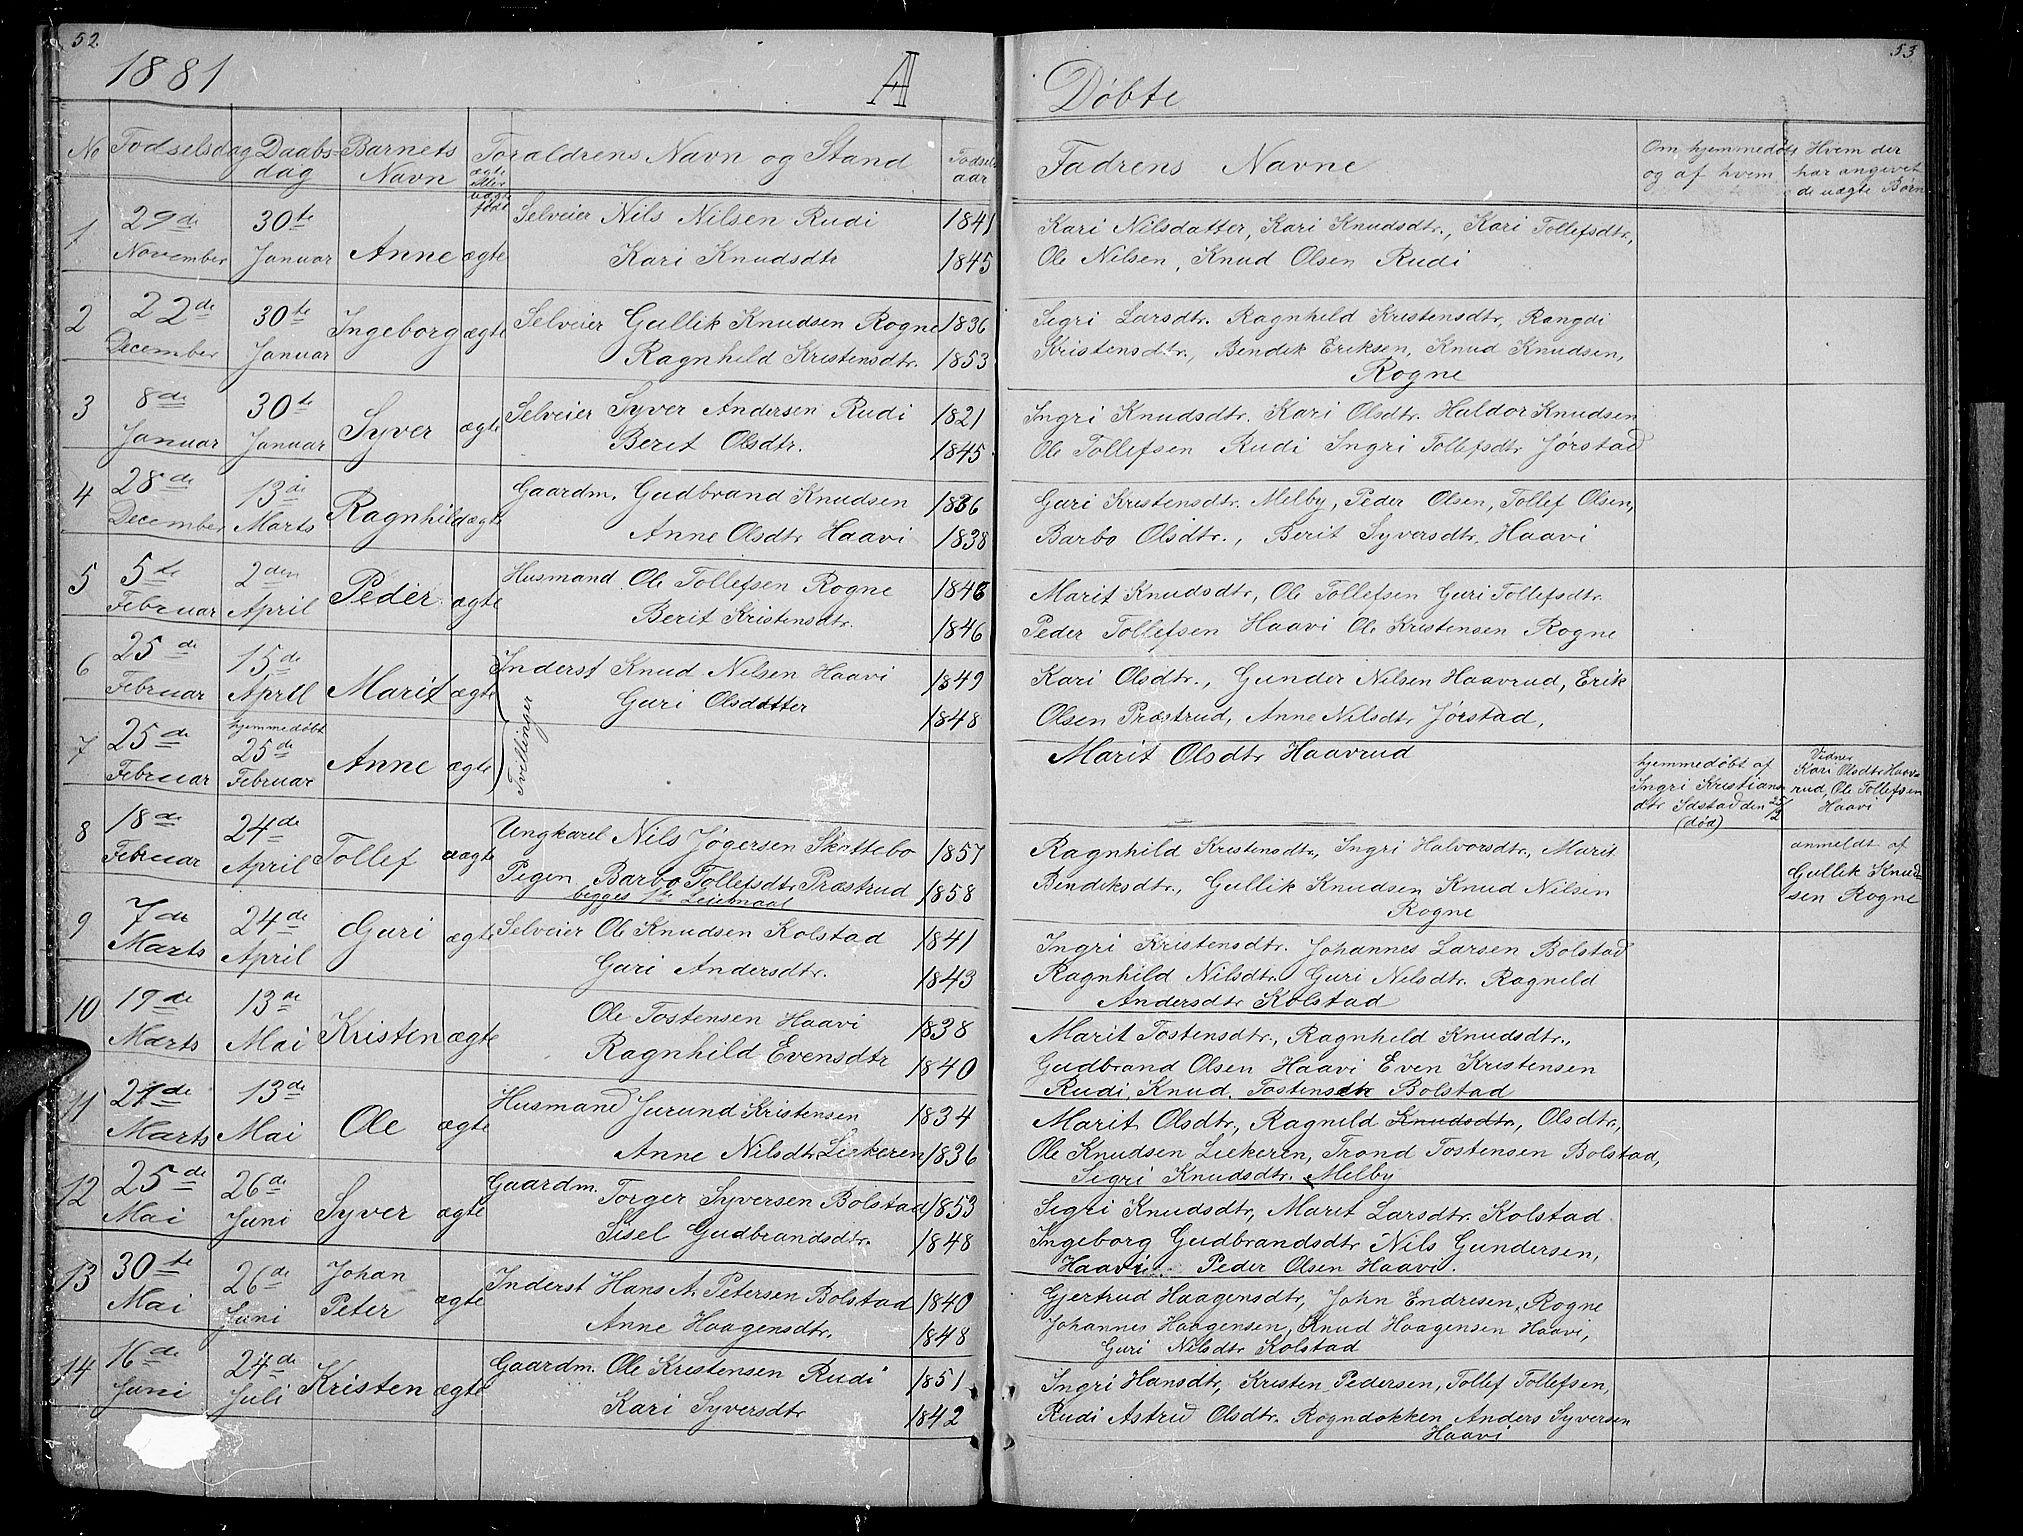 SAH, Øystre Slidre prestekontor, Klokkerbok nr. 3, 1866-1886, s. 52-53